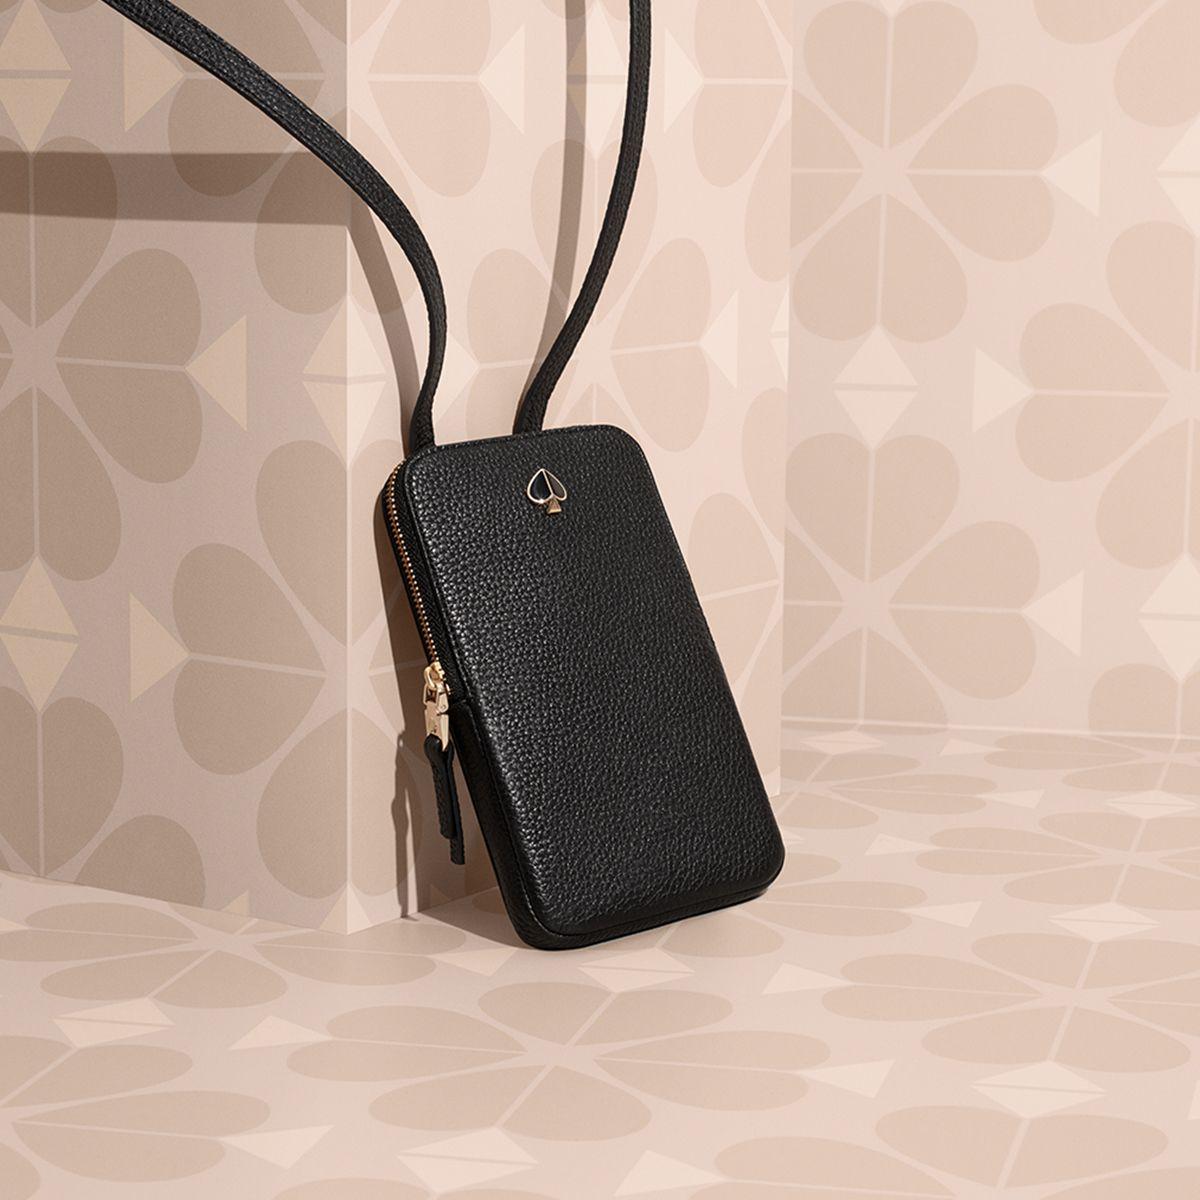 Kate Spade Purses   Handbags - Macy s 7c2130fca9ce5